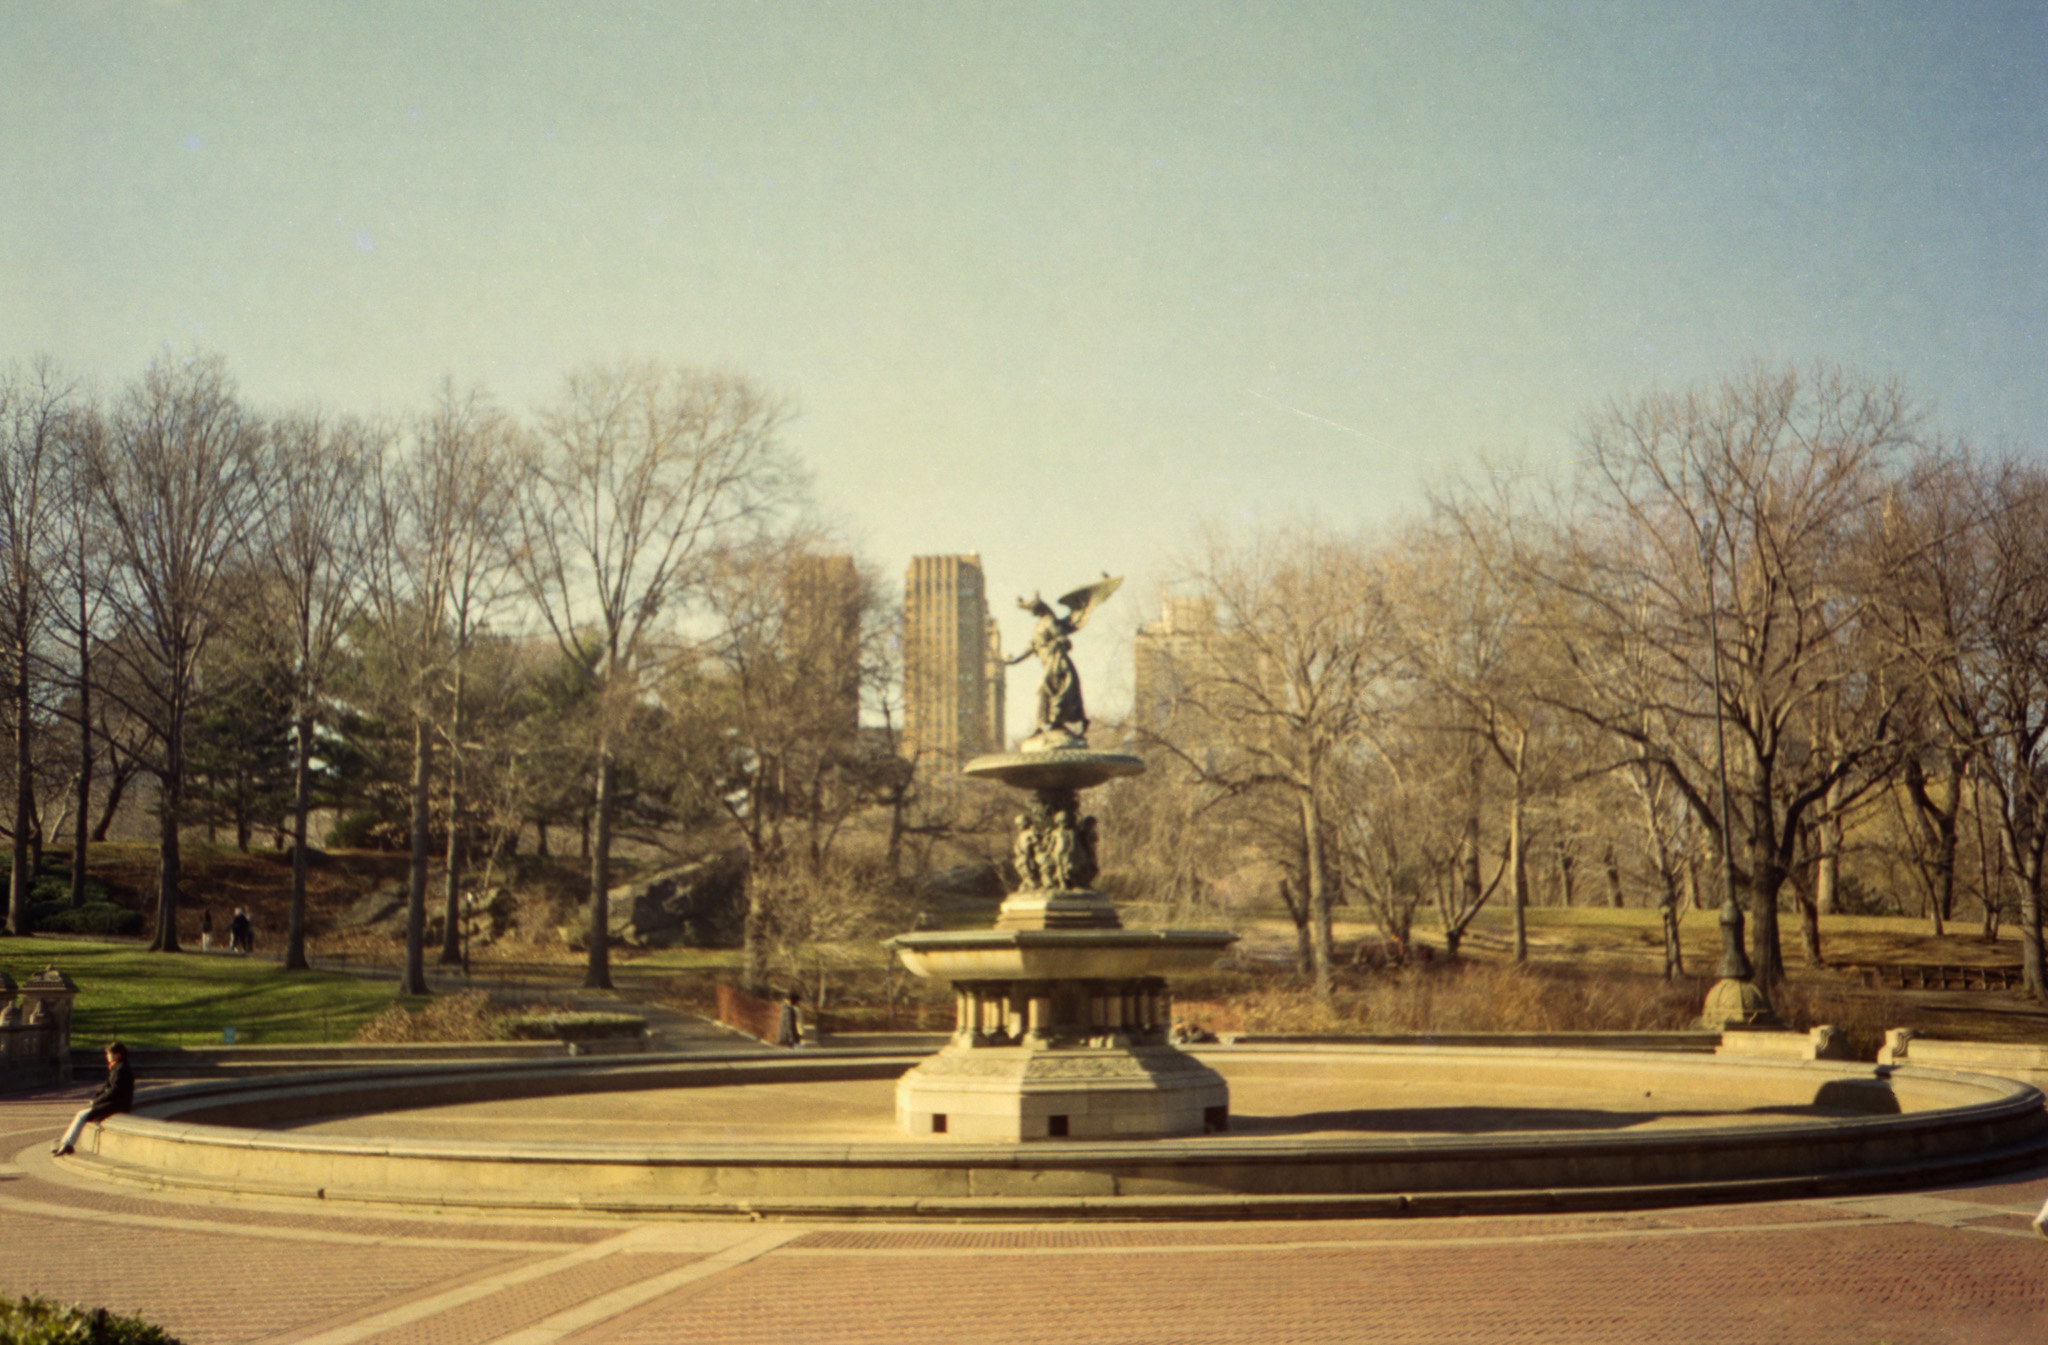 NYC-1999-034.jpg